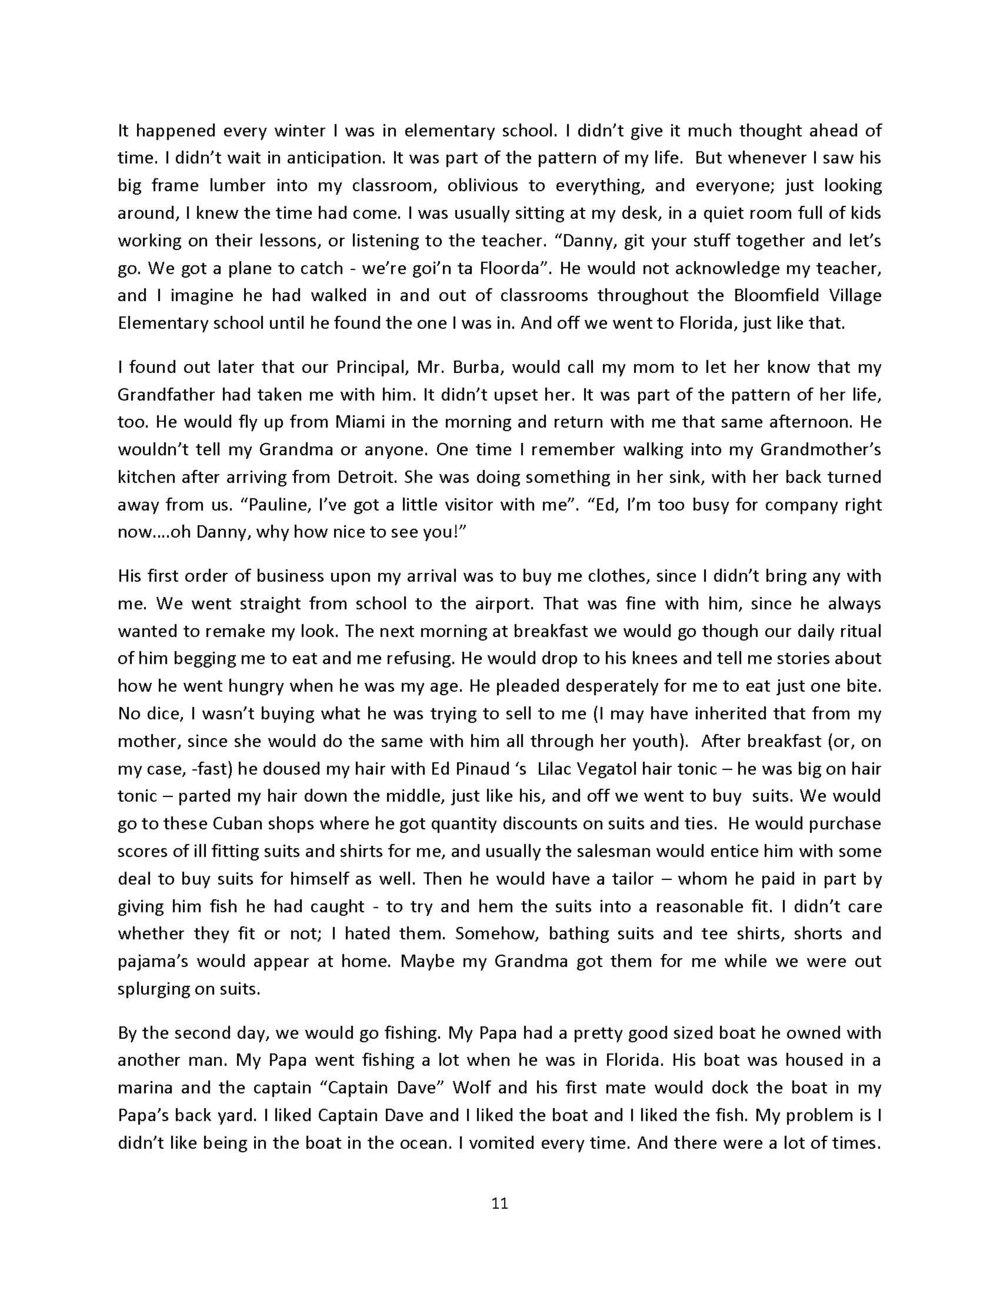 Papa Ed Stories -excerpts_Page_11.jpg